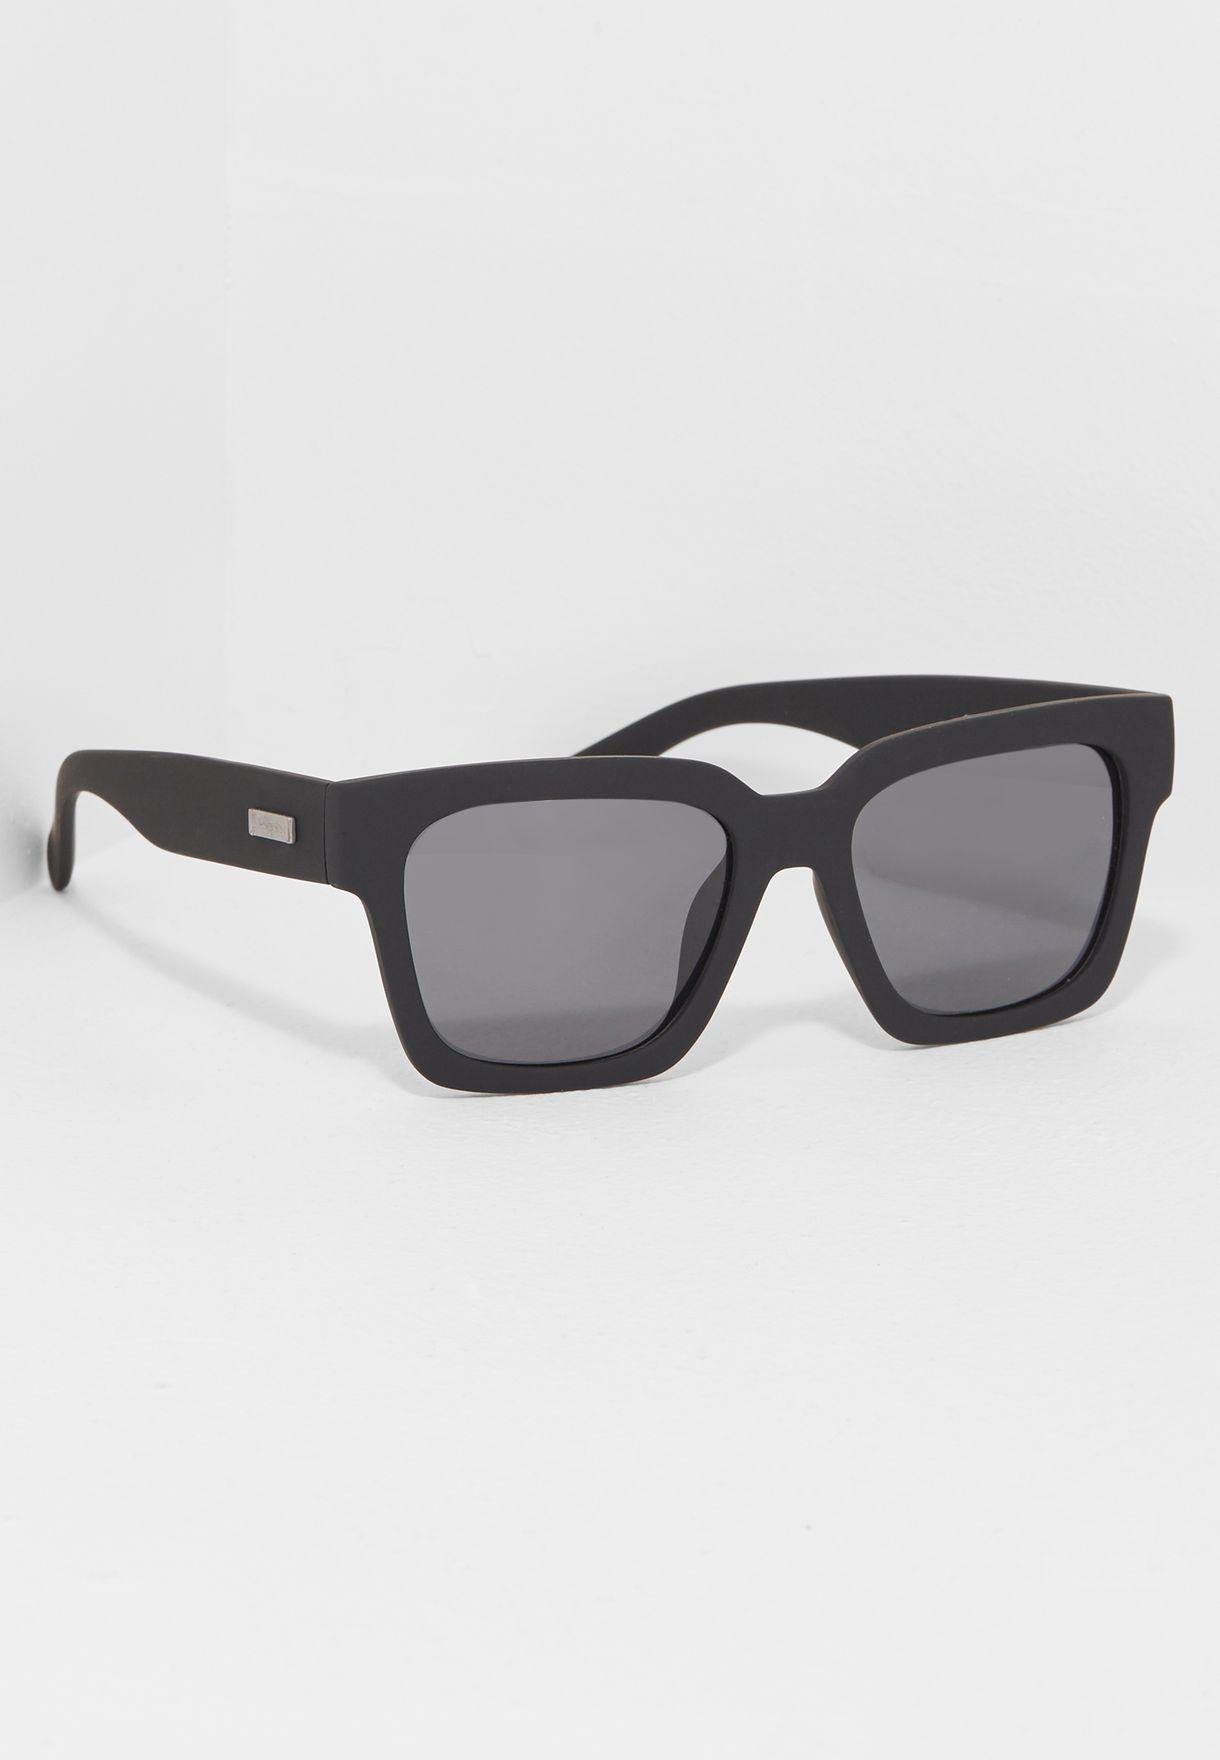 319b2d0bc تسوق نظارة شمسية ويك اند رايوت ماركة لو سبيكس لون أسود LSP1502125 في ...